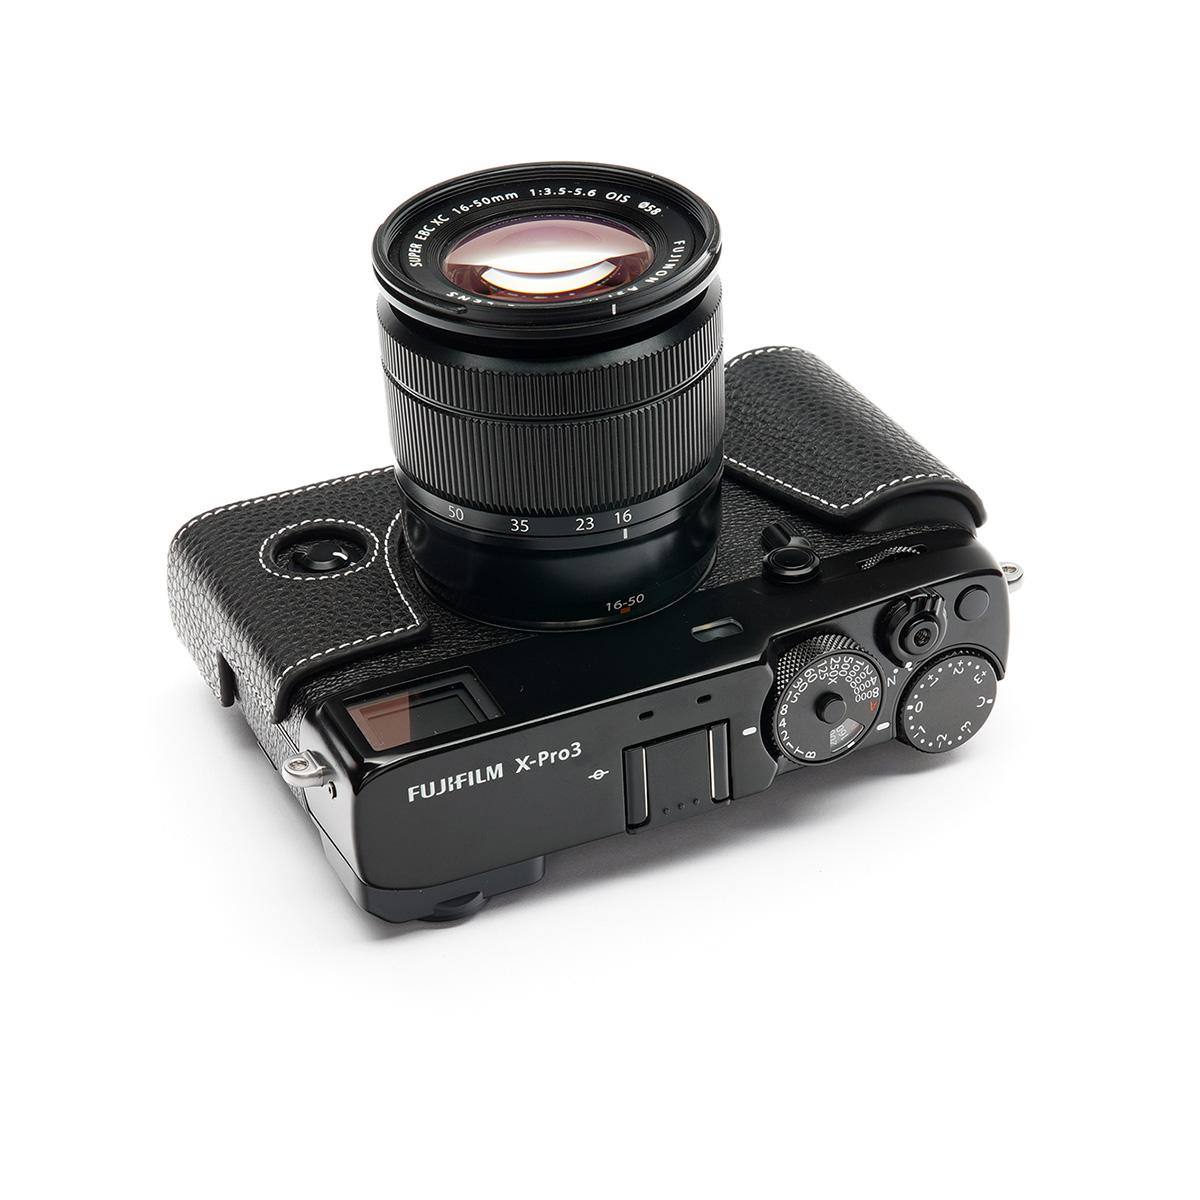 TP Original FUJIFIFILM X-Pro3 用 ボディーハーフケース ブラック